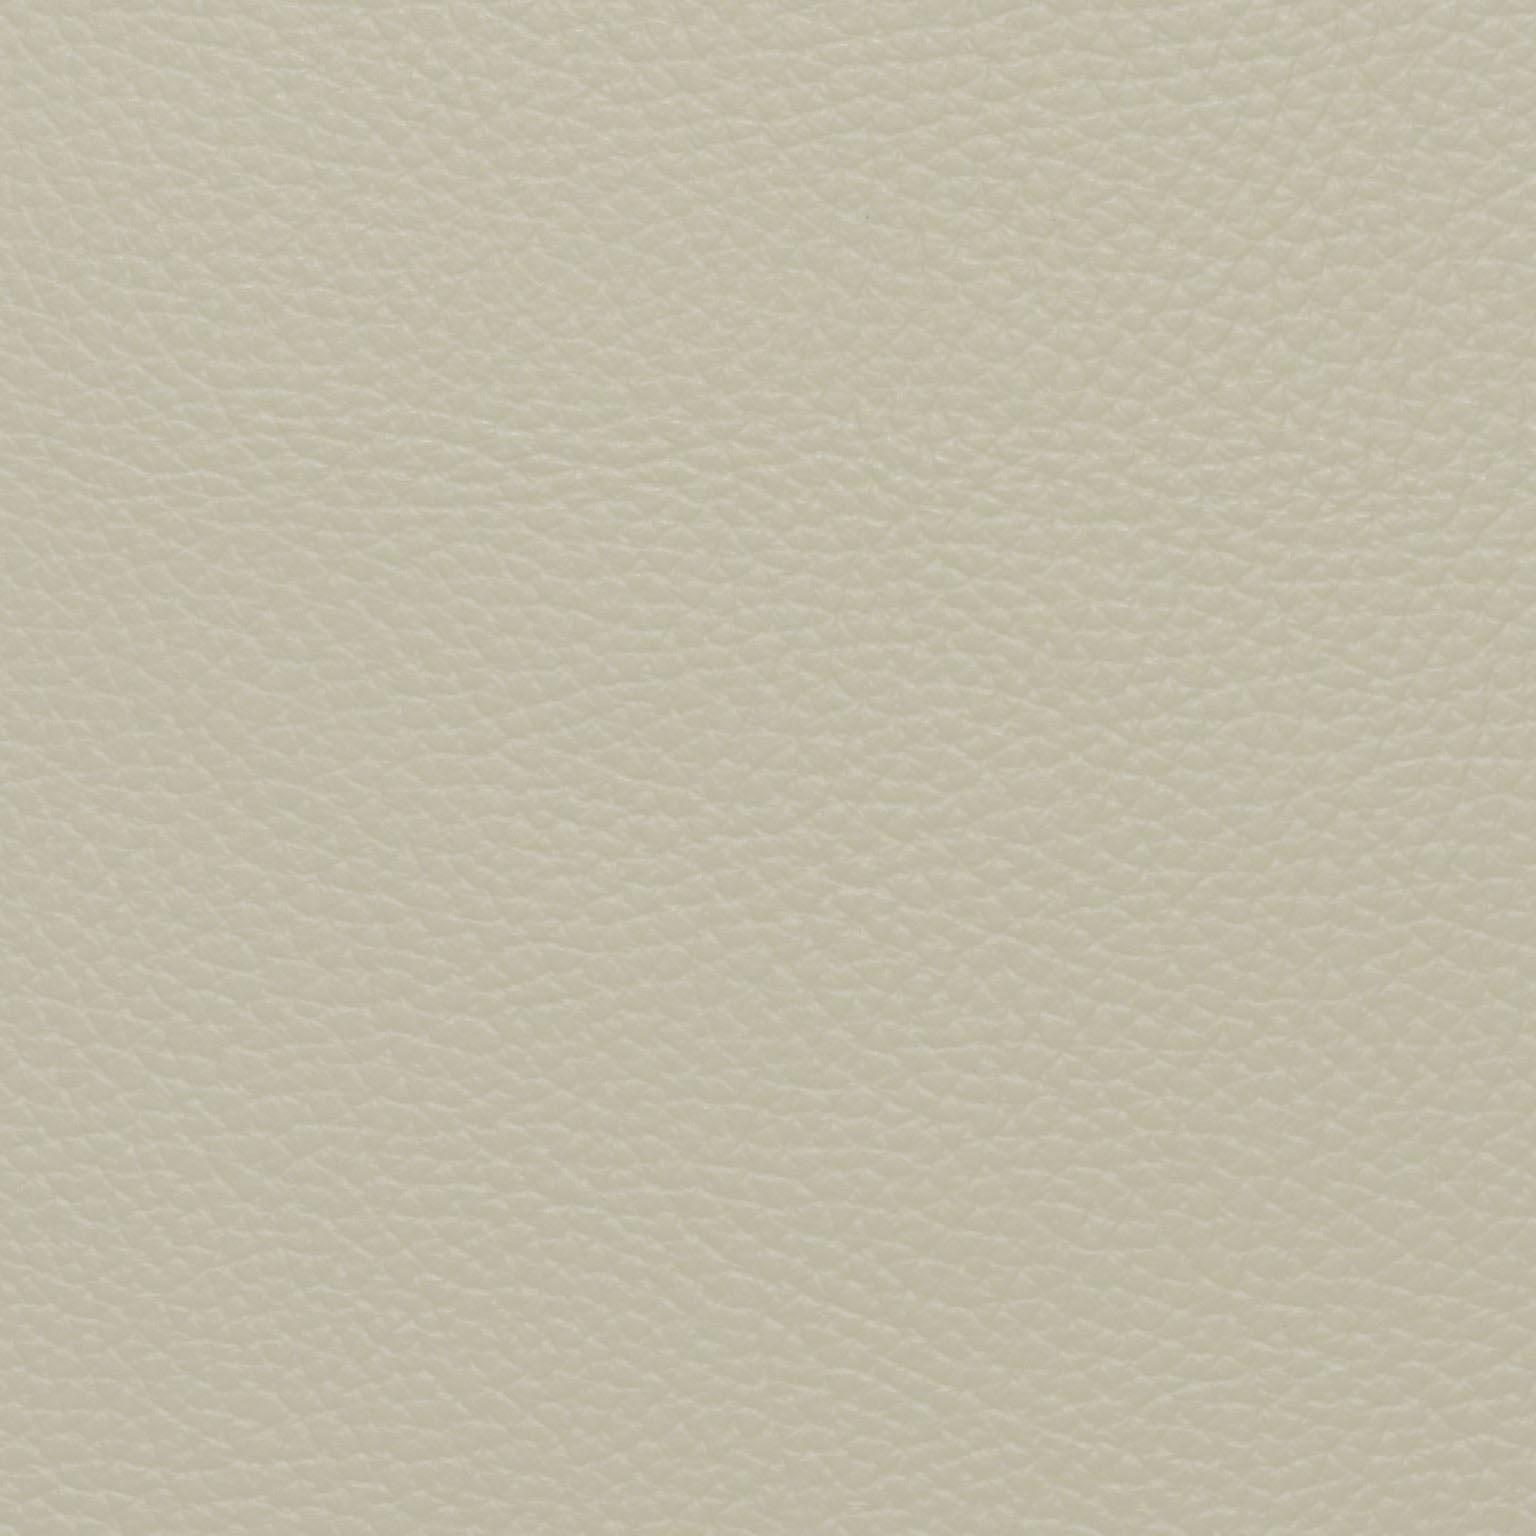 Ranchio leather_p11-004